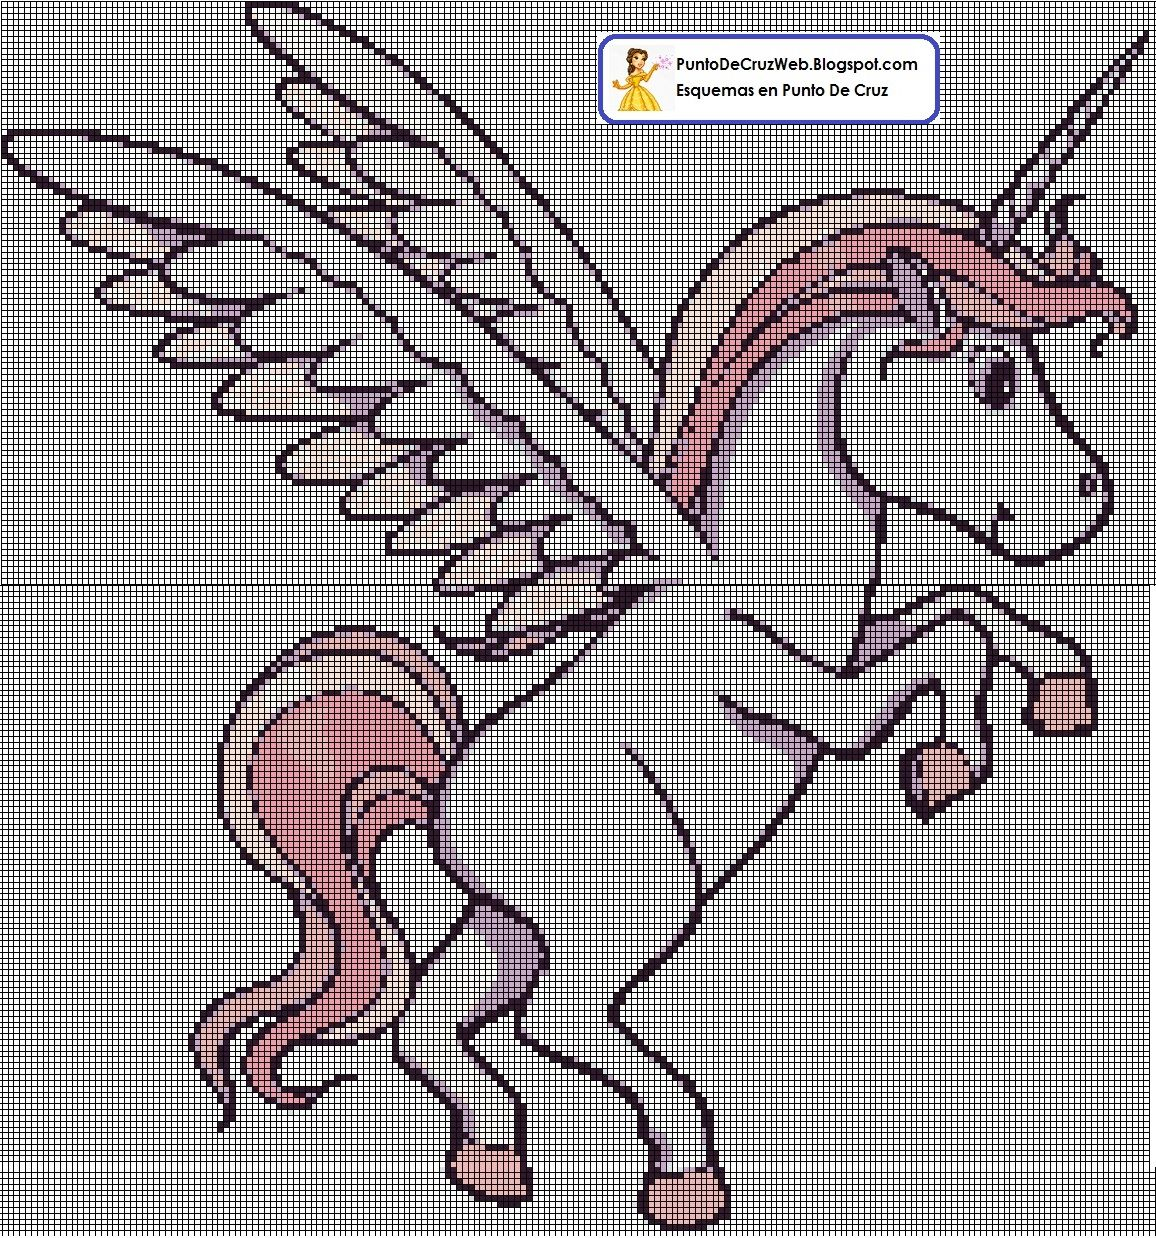 Unicornio Punto De Cruz Caballos Punto De Cruz Punto De Cruz Esquemas Punto De Cruz